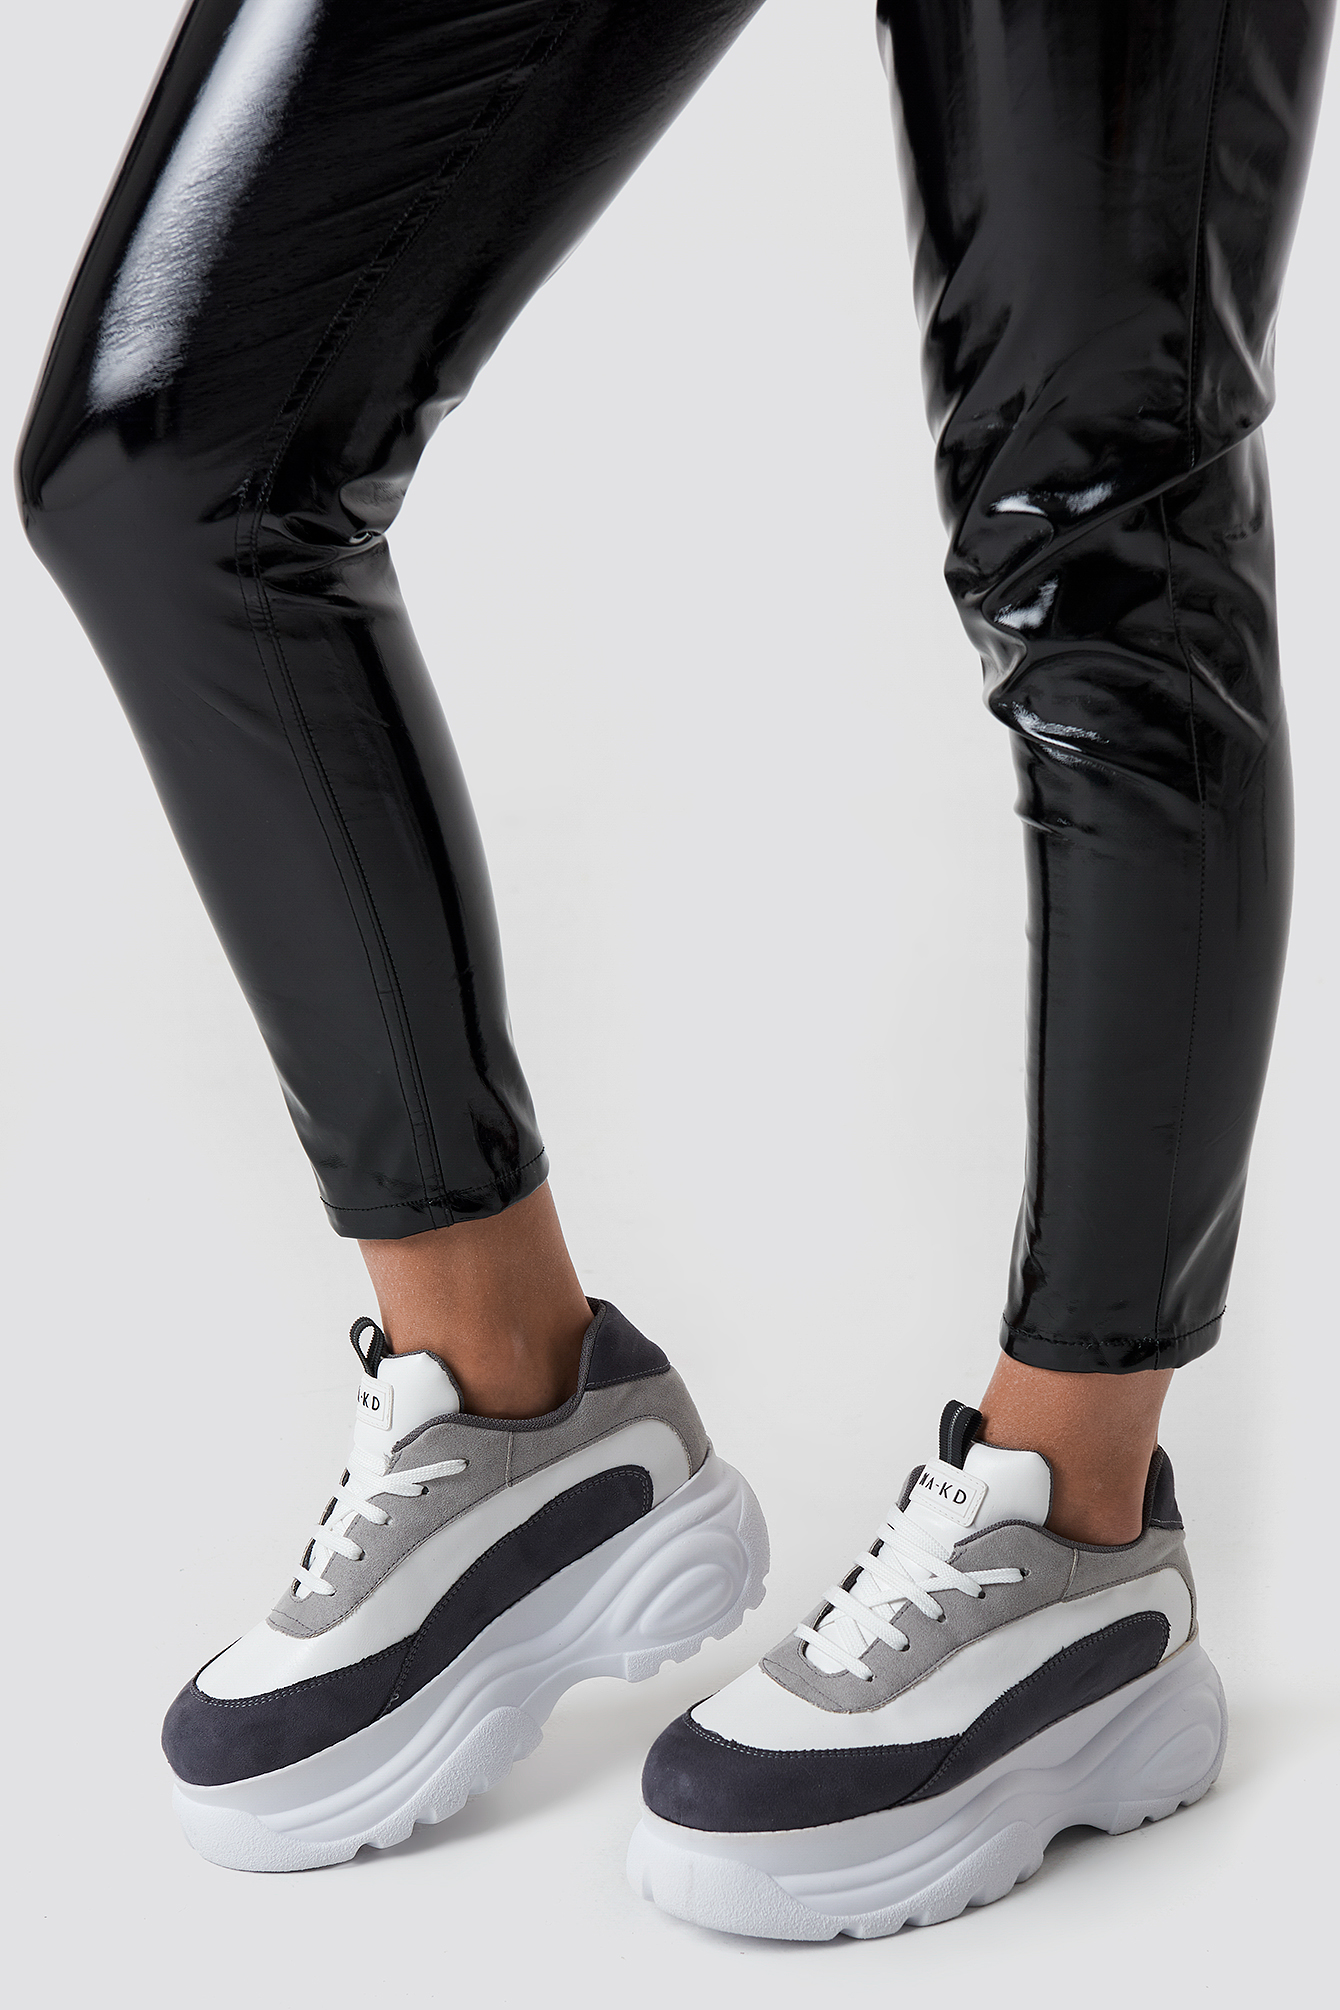 na-kd shoes -  Platform Chunky Trainers - White,Grey